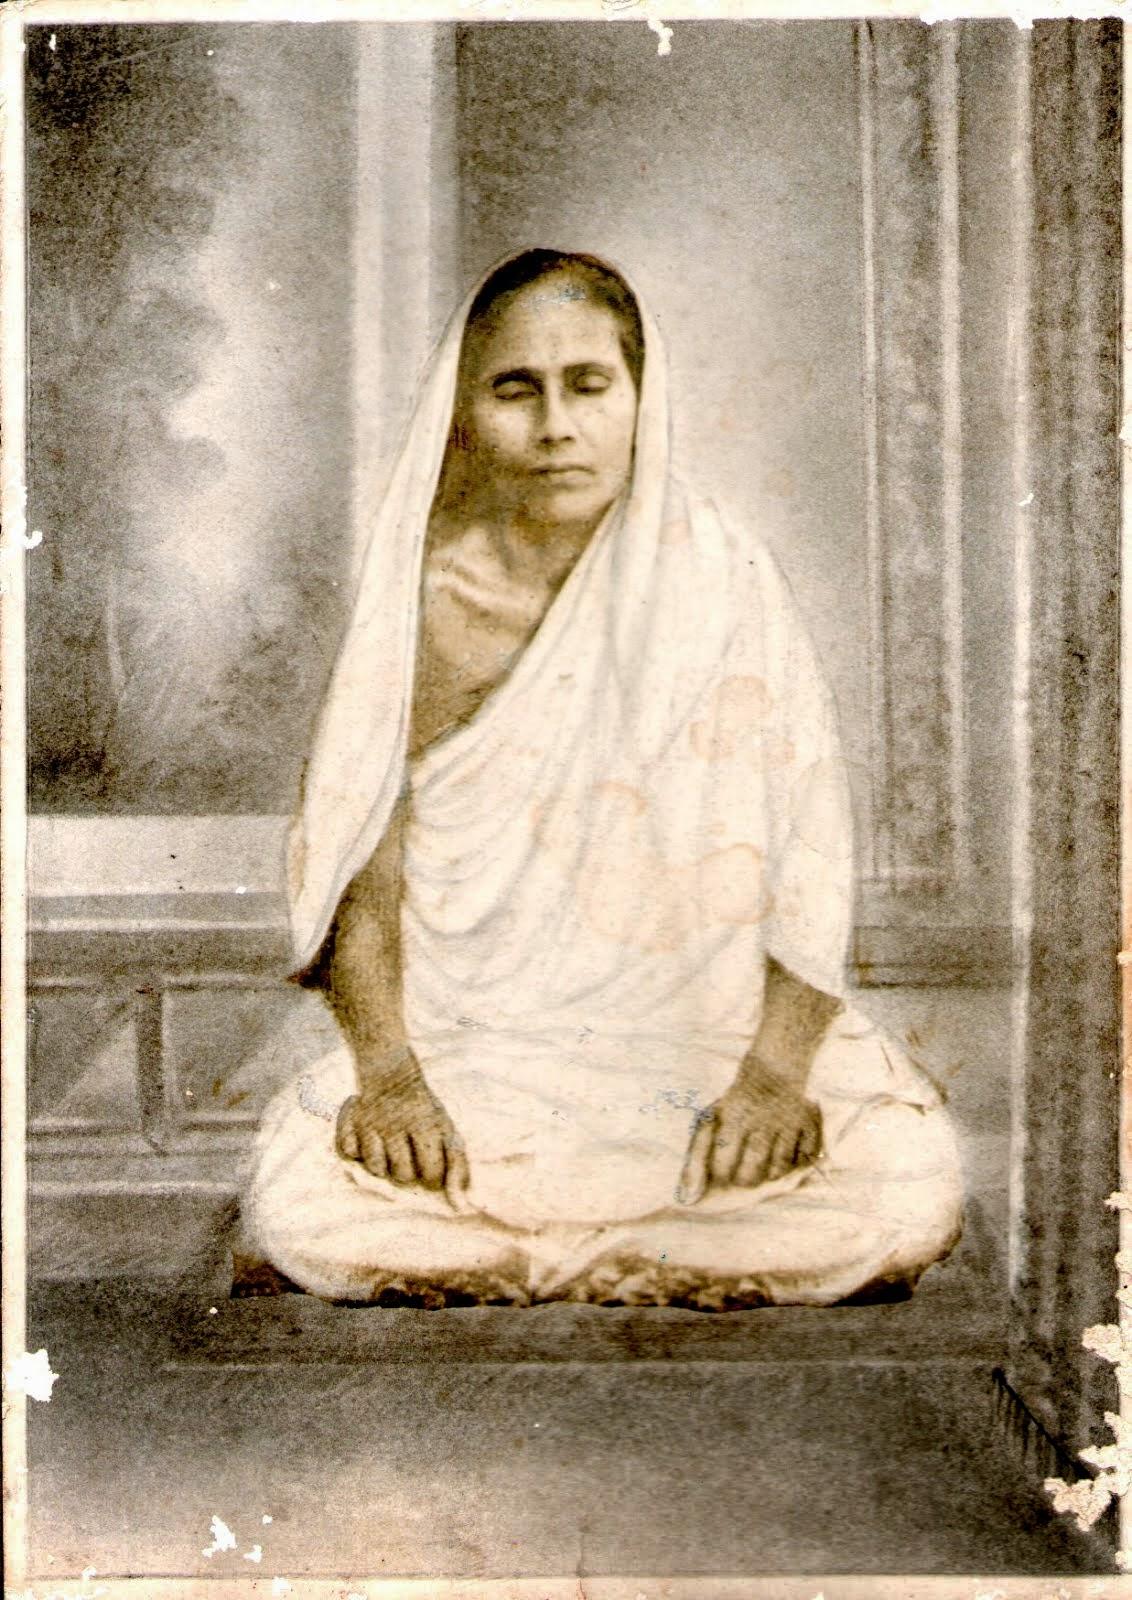 Kishori Mohan Bandyopadhyay's wife Khetroprosadi